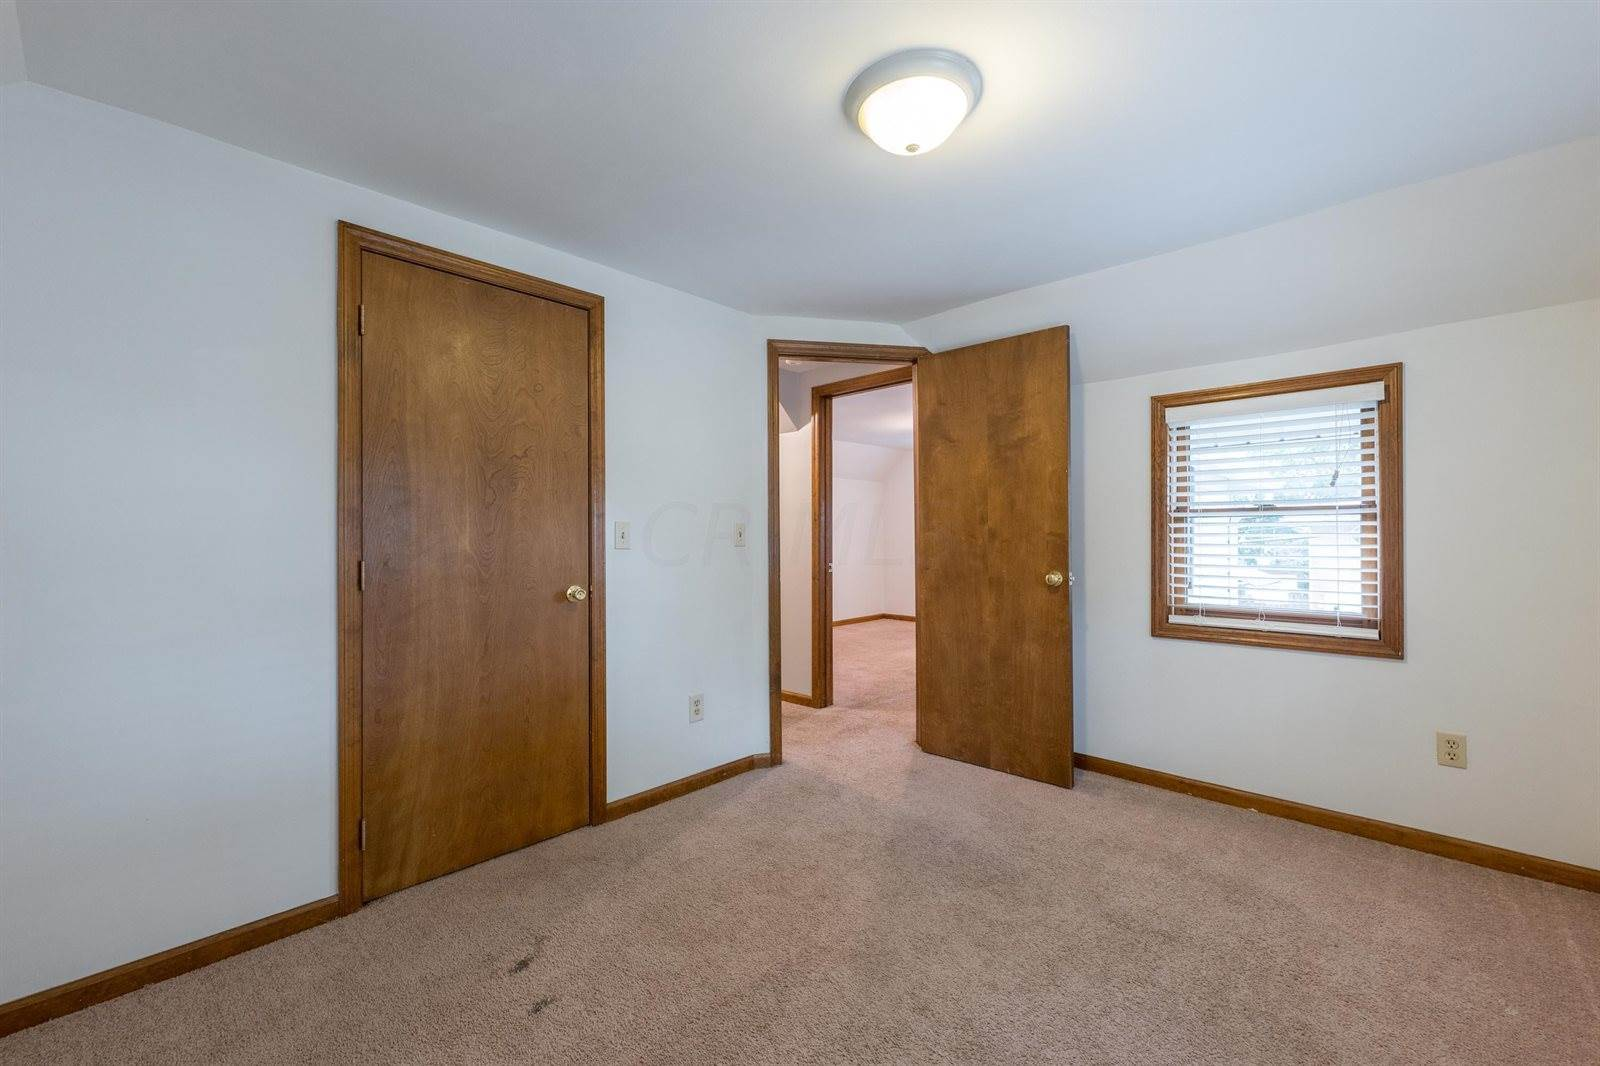 113 South Frey Avenue, West Jefferson, OH 43162